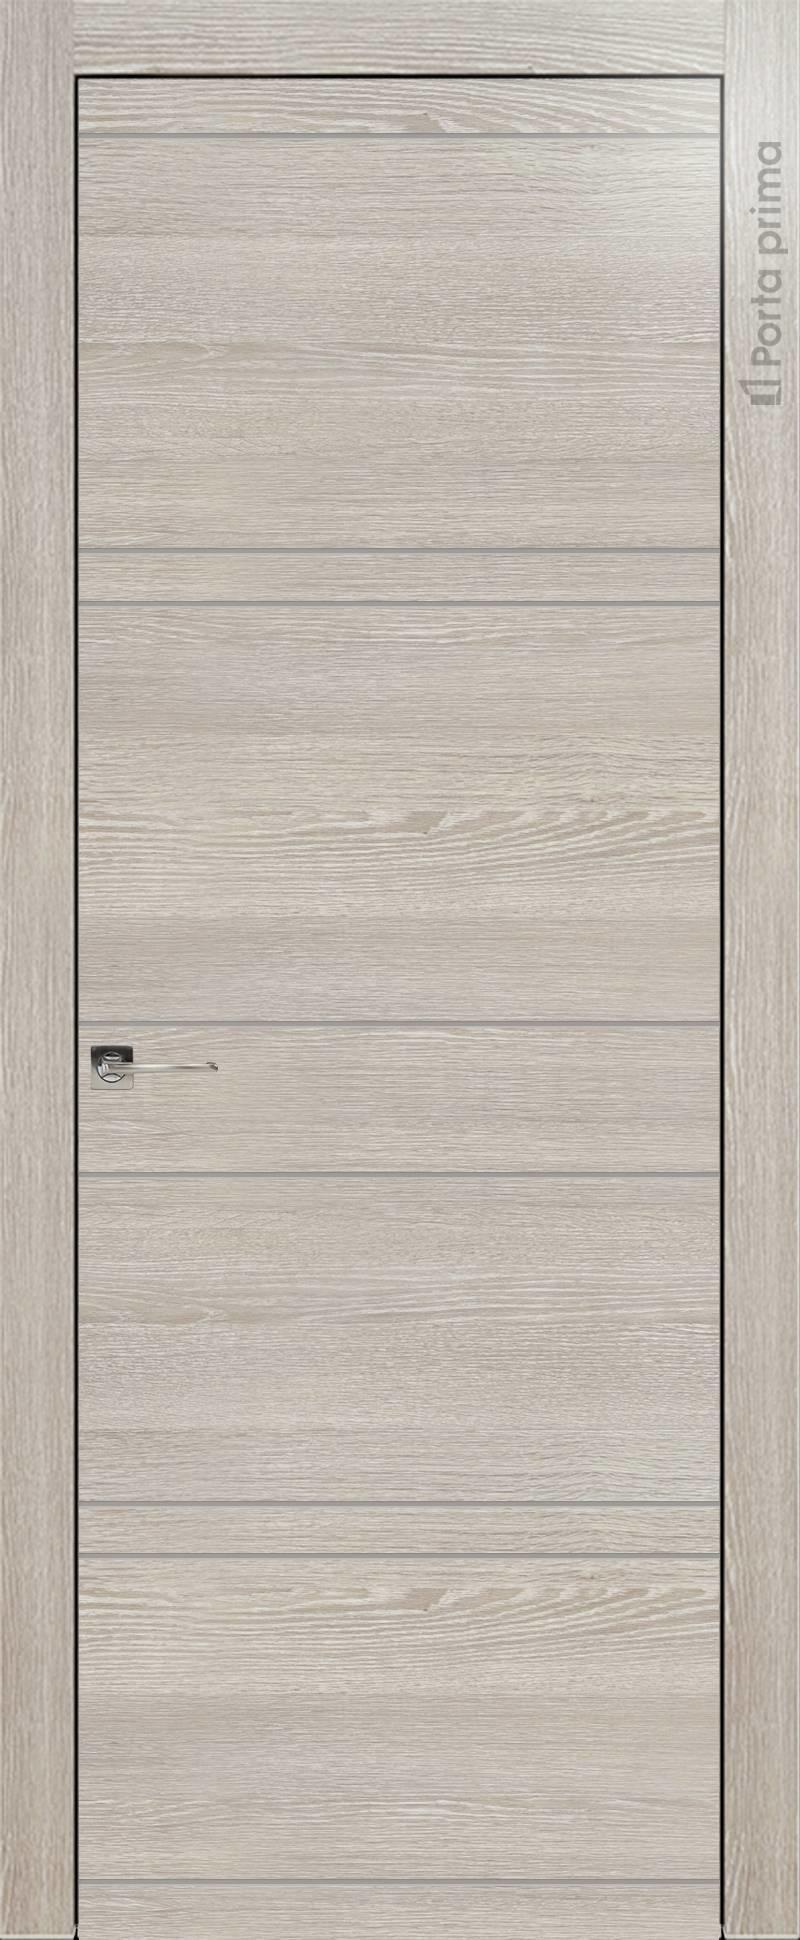 Tivoli Е-2 цвет - Серый дуб Без стекла (ДГ)